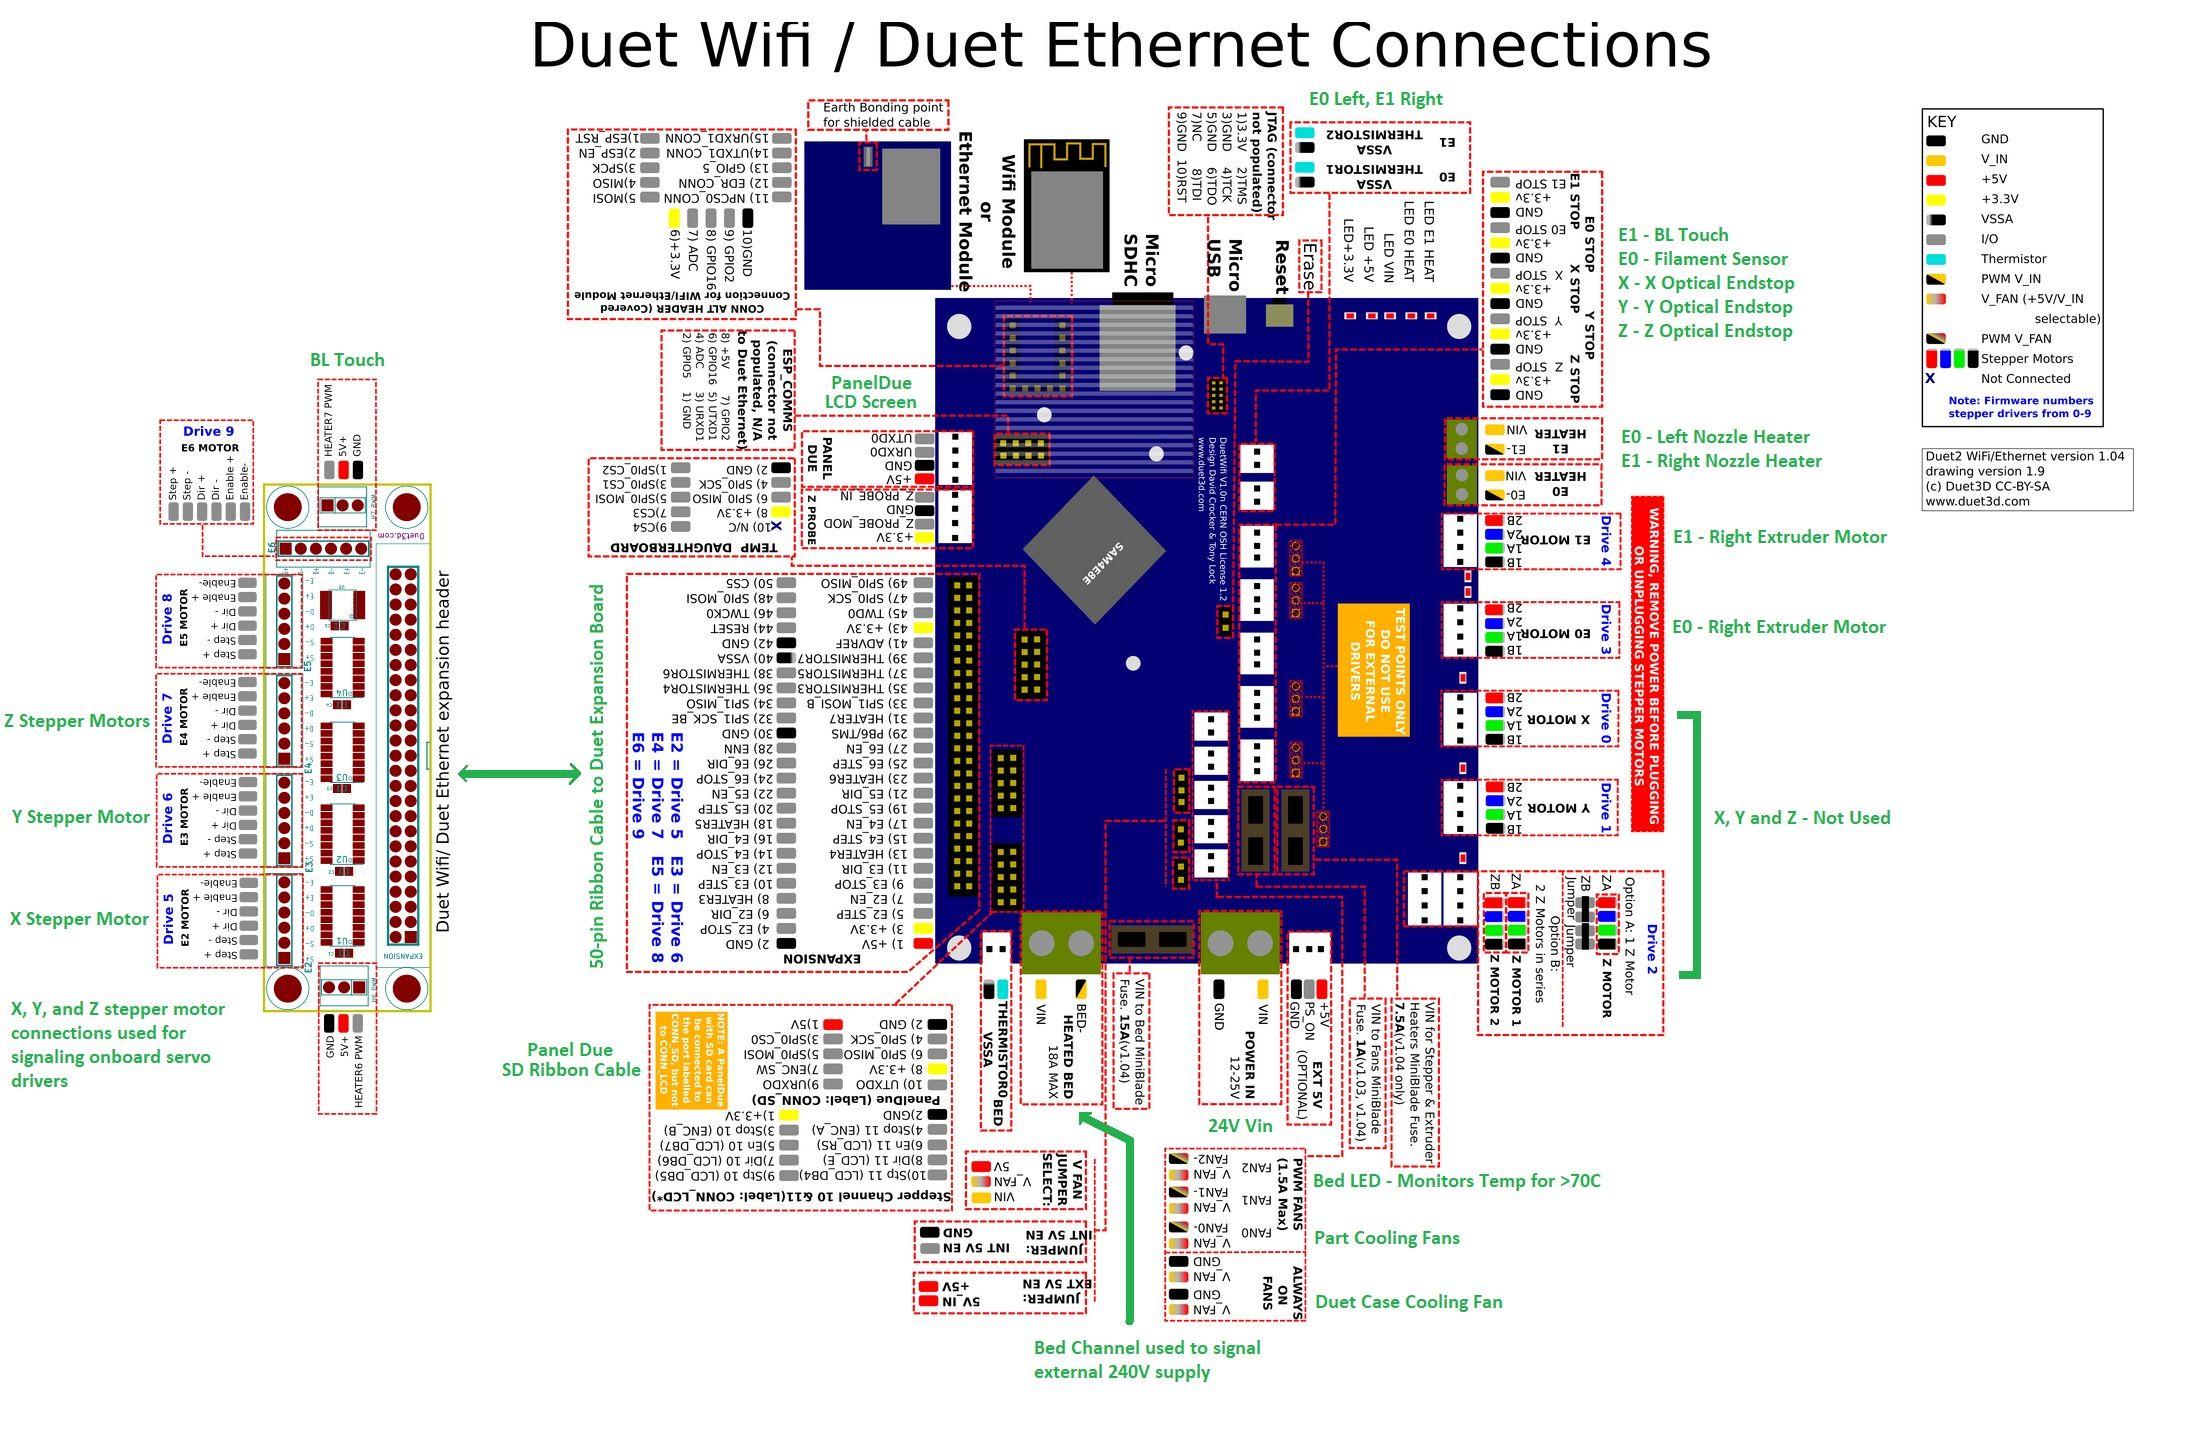 Bltouch Wiring Diagram from forum.duet3d.com